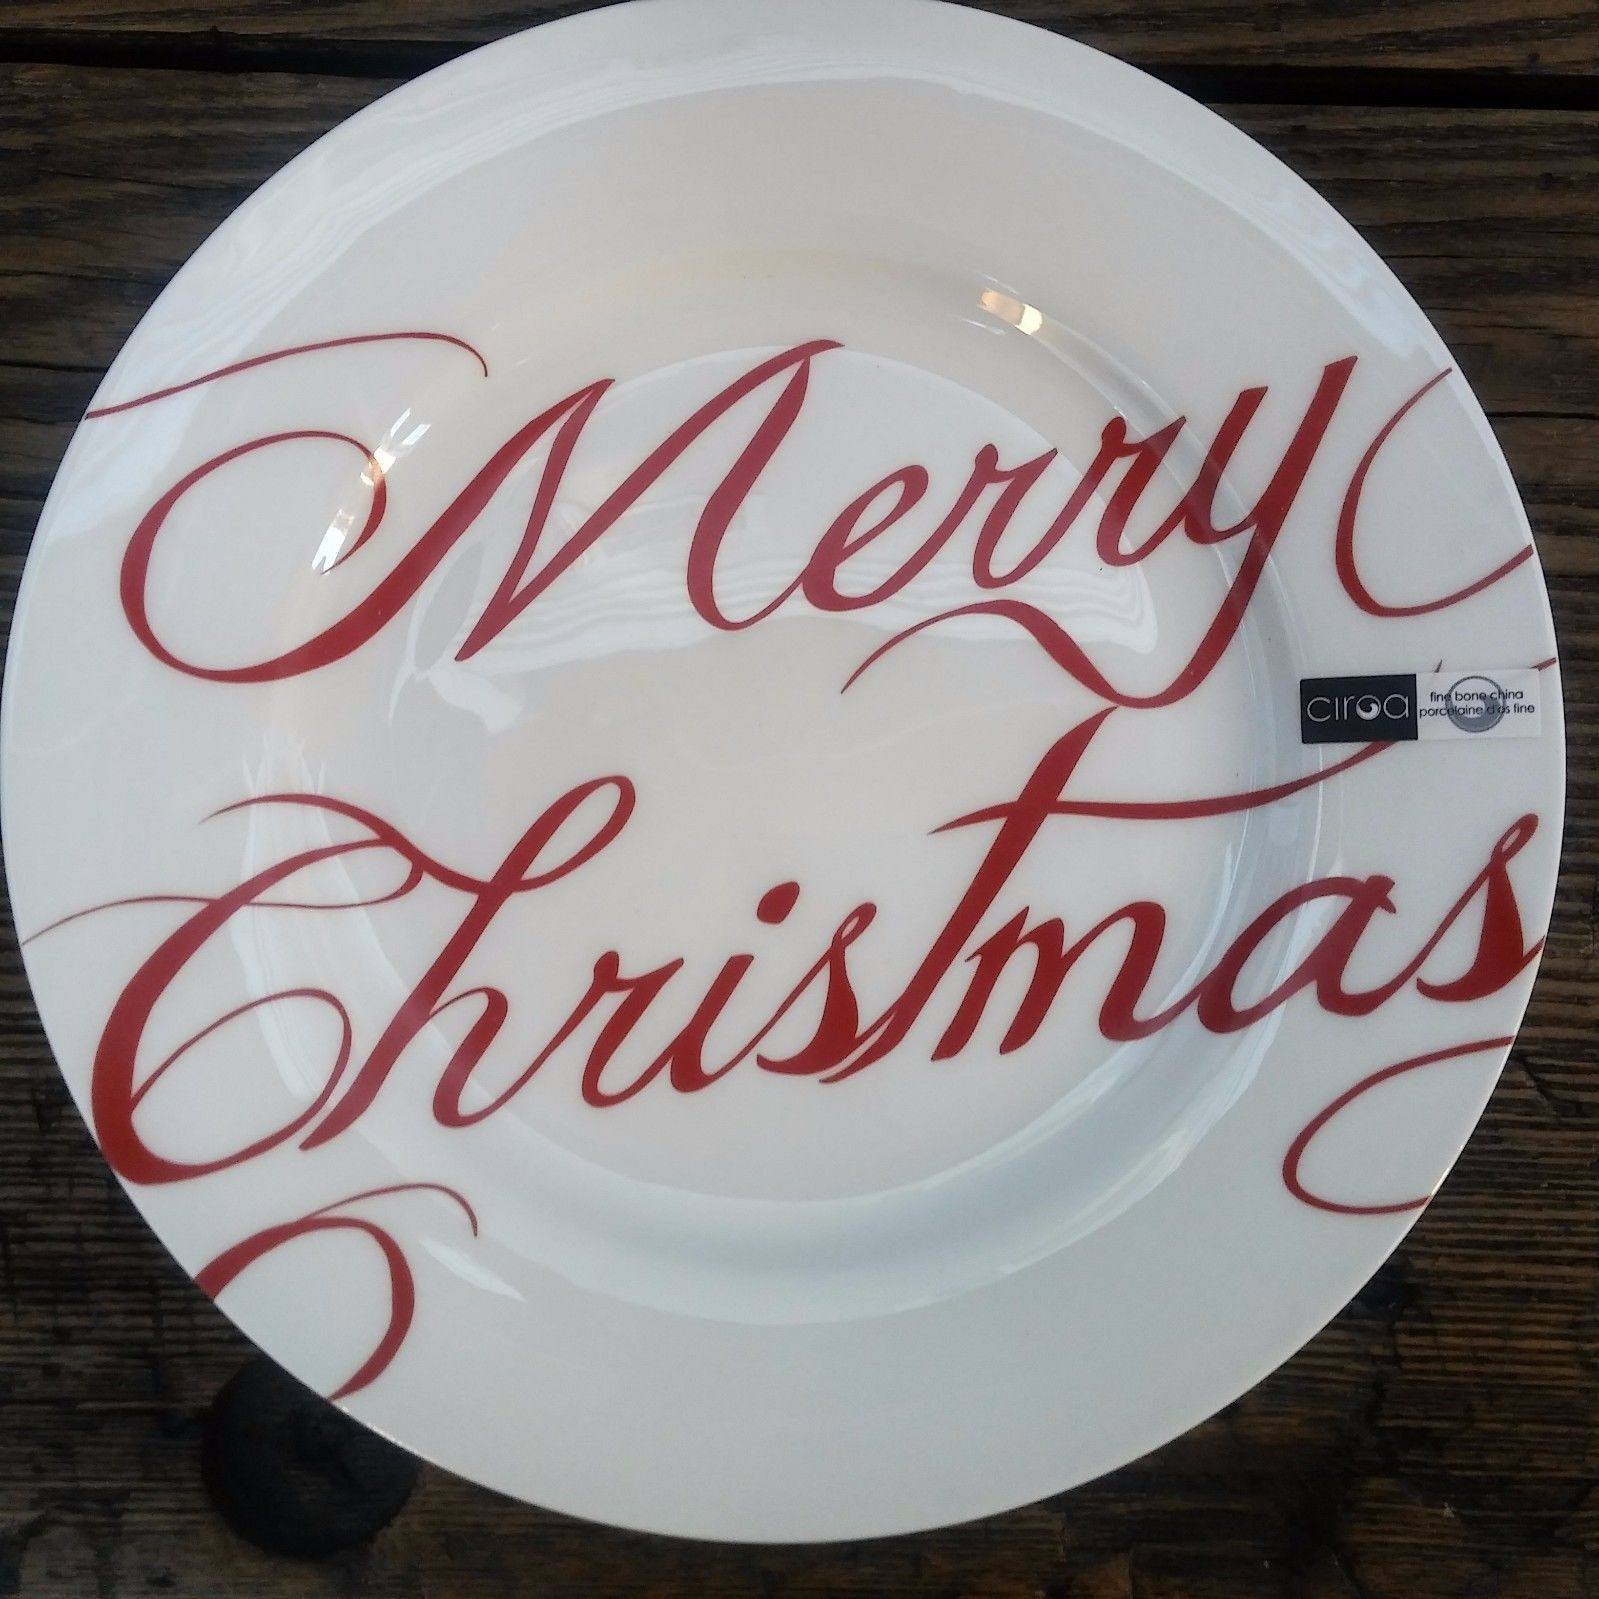 CIROA Merry Christmas 4 Dinner Plates Bone China 11 White/Red | eBay & NEW! CIROA Merry Christmas 4 Dinner Plates Bone China 11